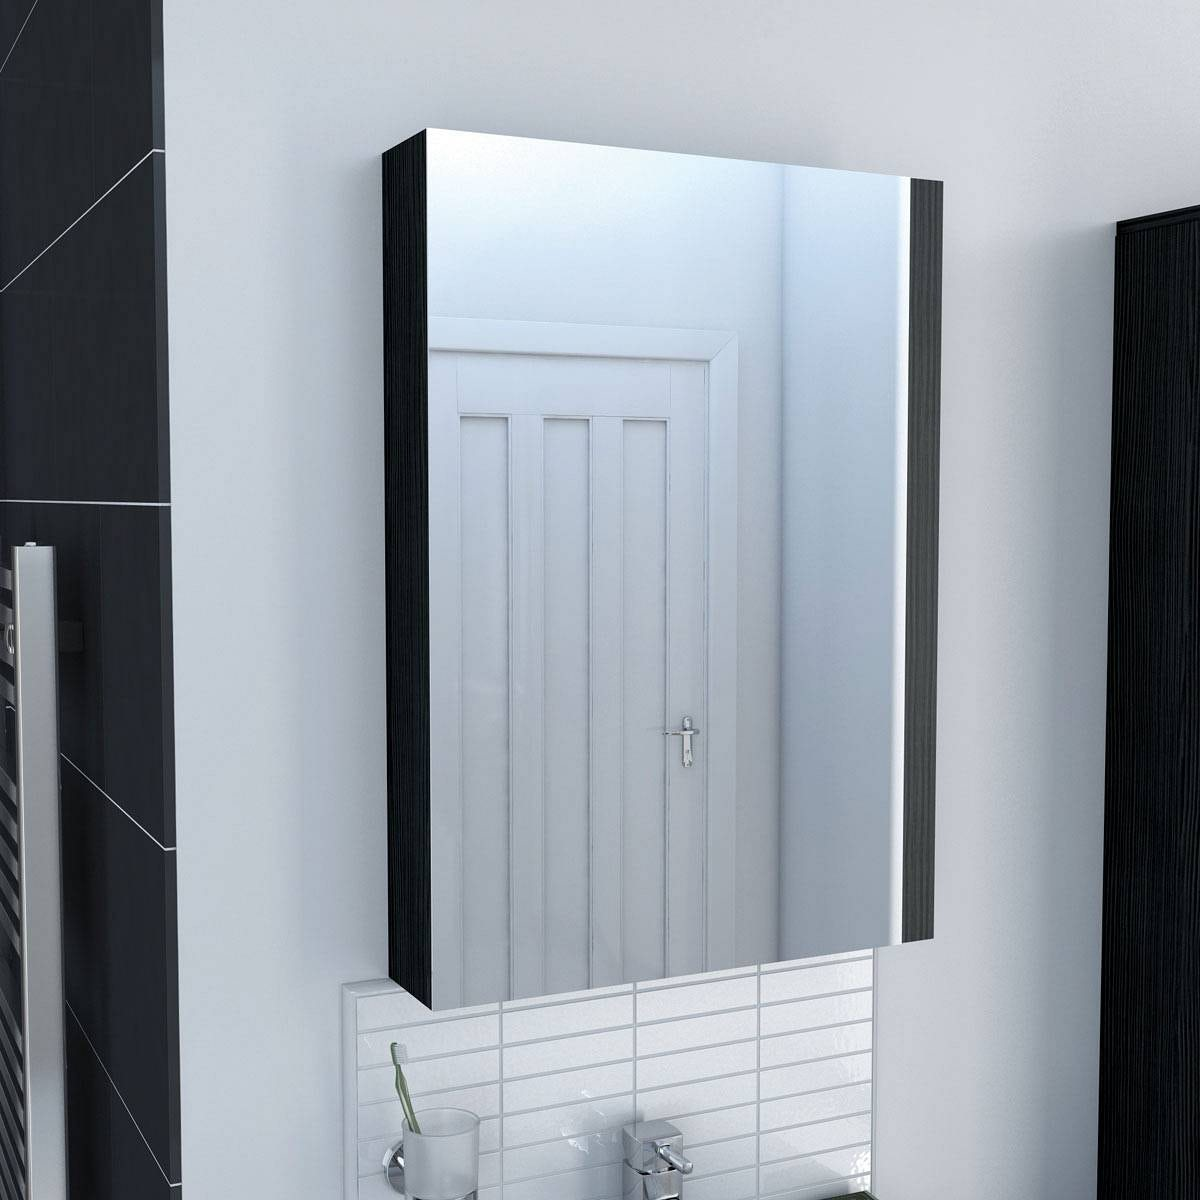 Bathroom Mirrors Victoria Plumb drift essen mirror cabinet | victoriaplum